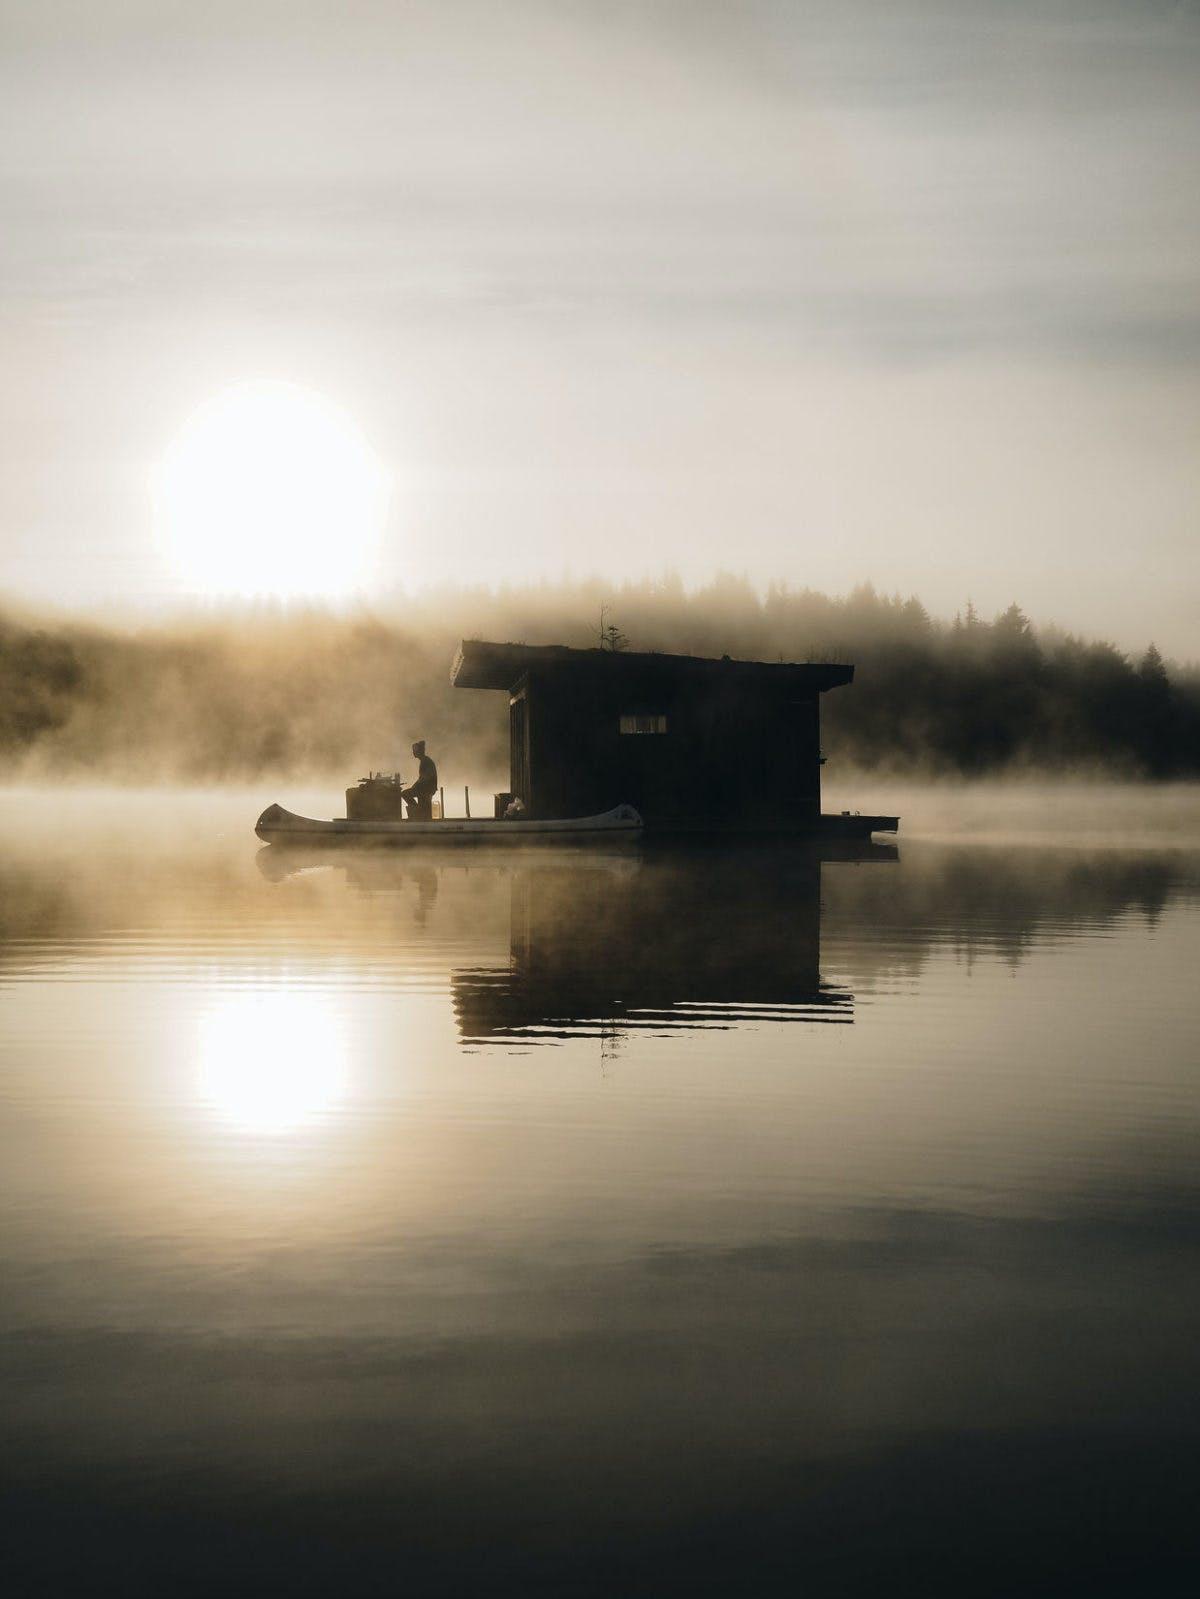 Njut av en unik glampingupplevelse på en flytande stuga mitt på sjön